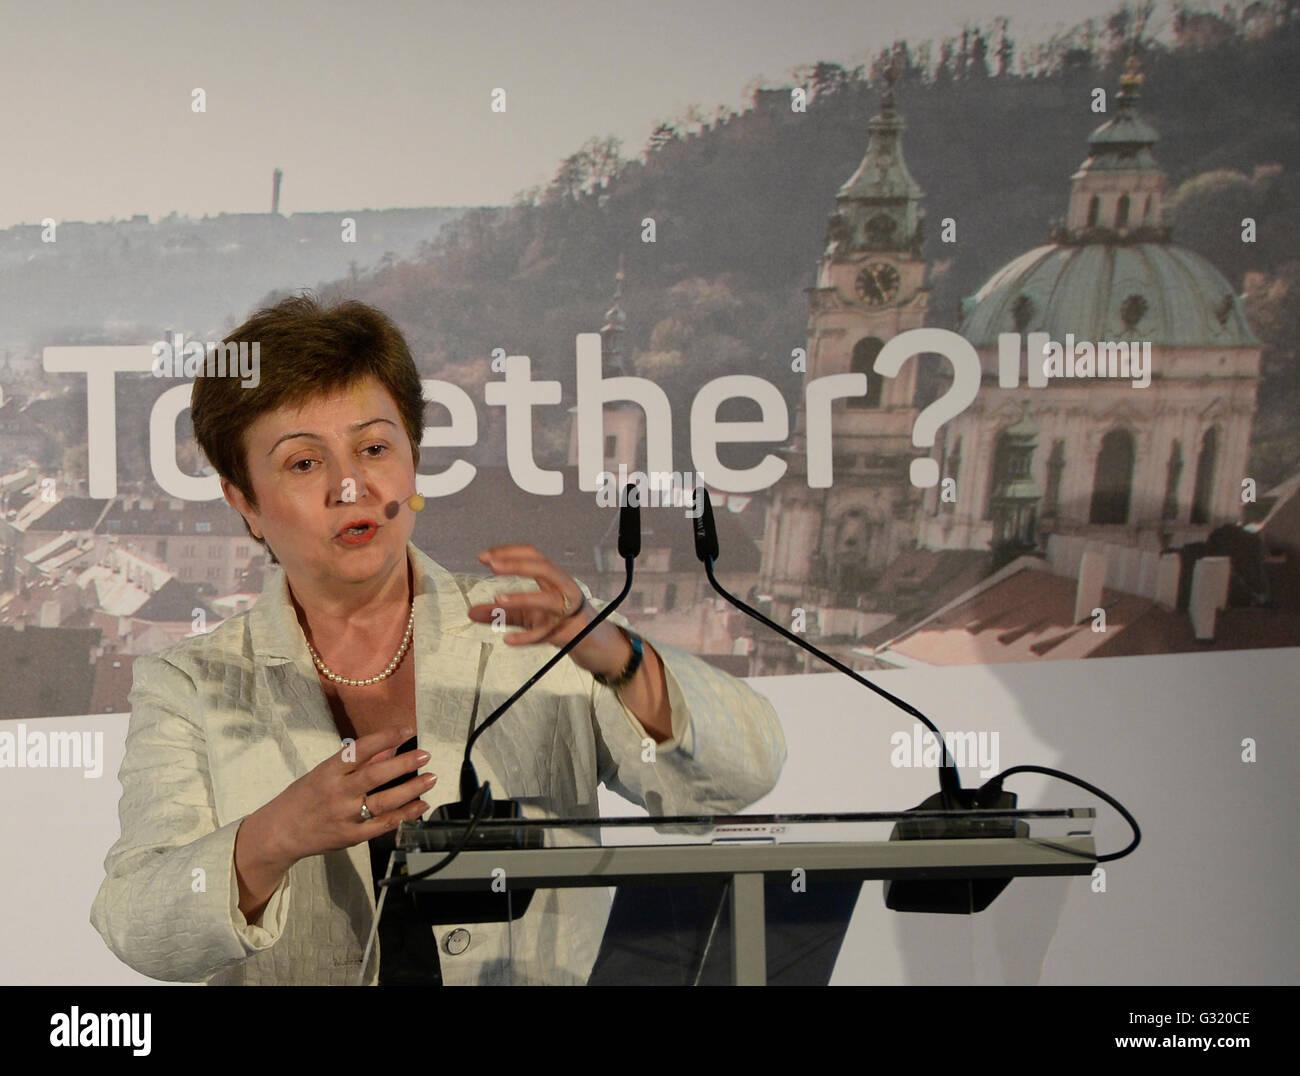 Prague, Czech Republic. 06th June, 2016. EC Vice-President Kristalina Georgieva said she shares view that the negative Stock Photo